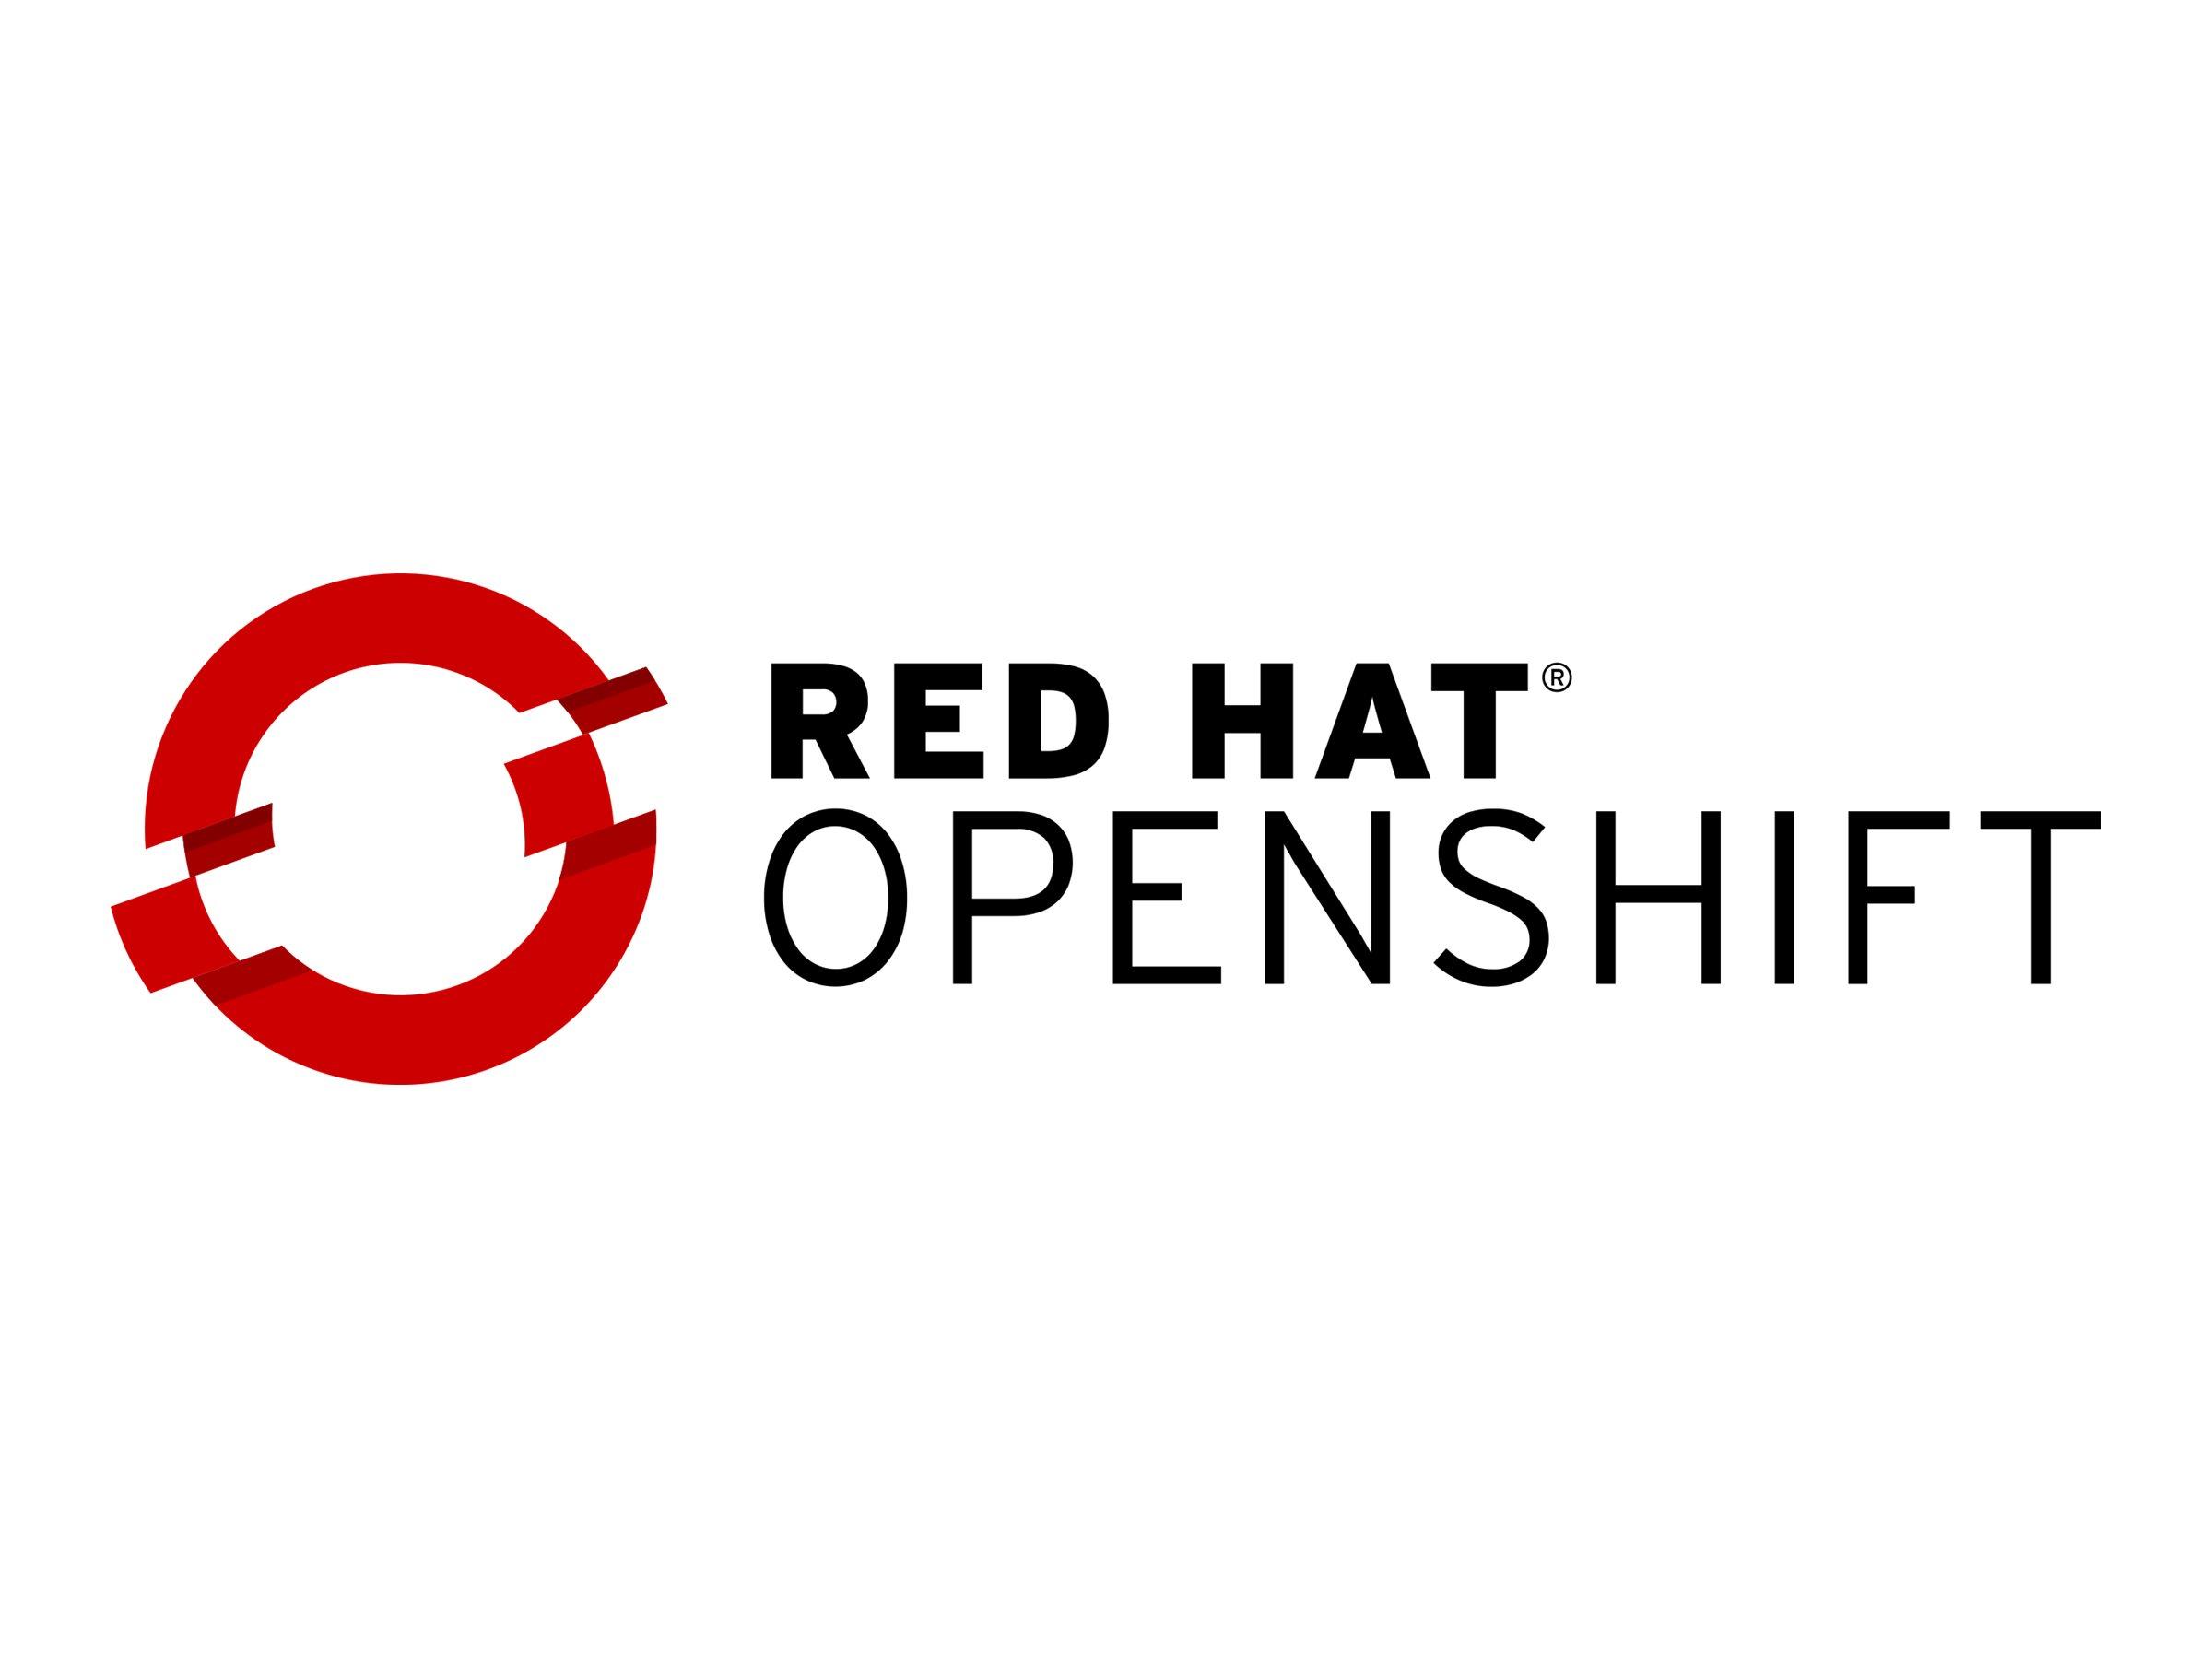 OpenShift Application Runtimes Plus - Standardabonnement (3 Jahre) - 2 Kerne, 4 vCPU